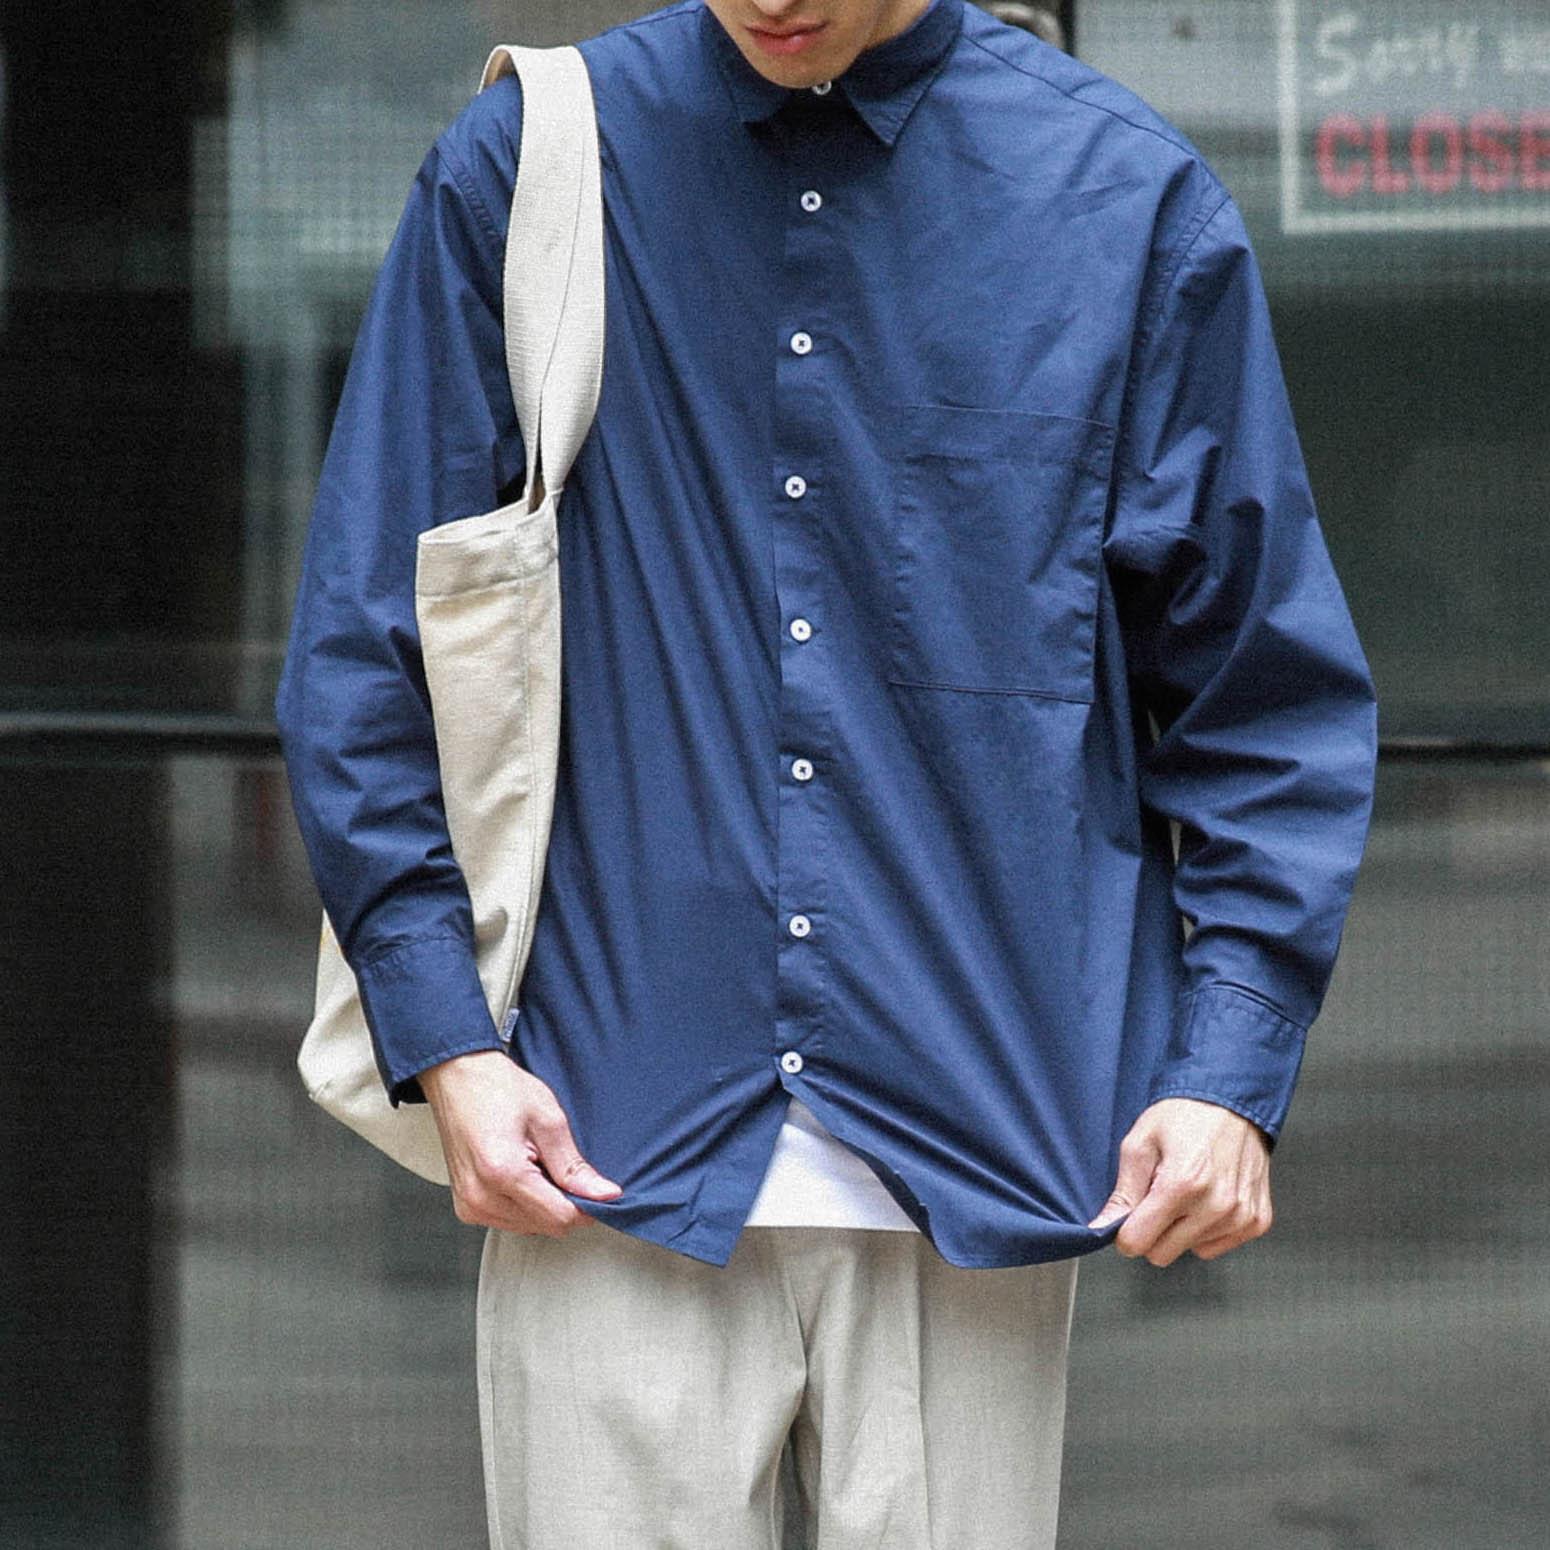 Usd 3992 Midnightblue Shirt Midnight Blue Shirt Shirt Loose